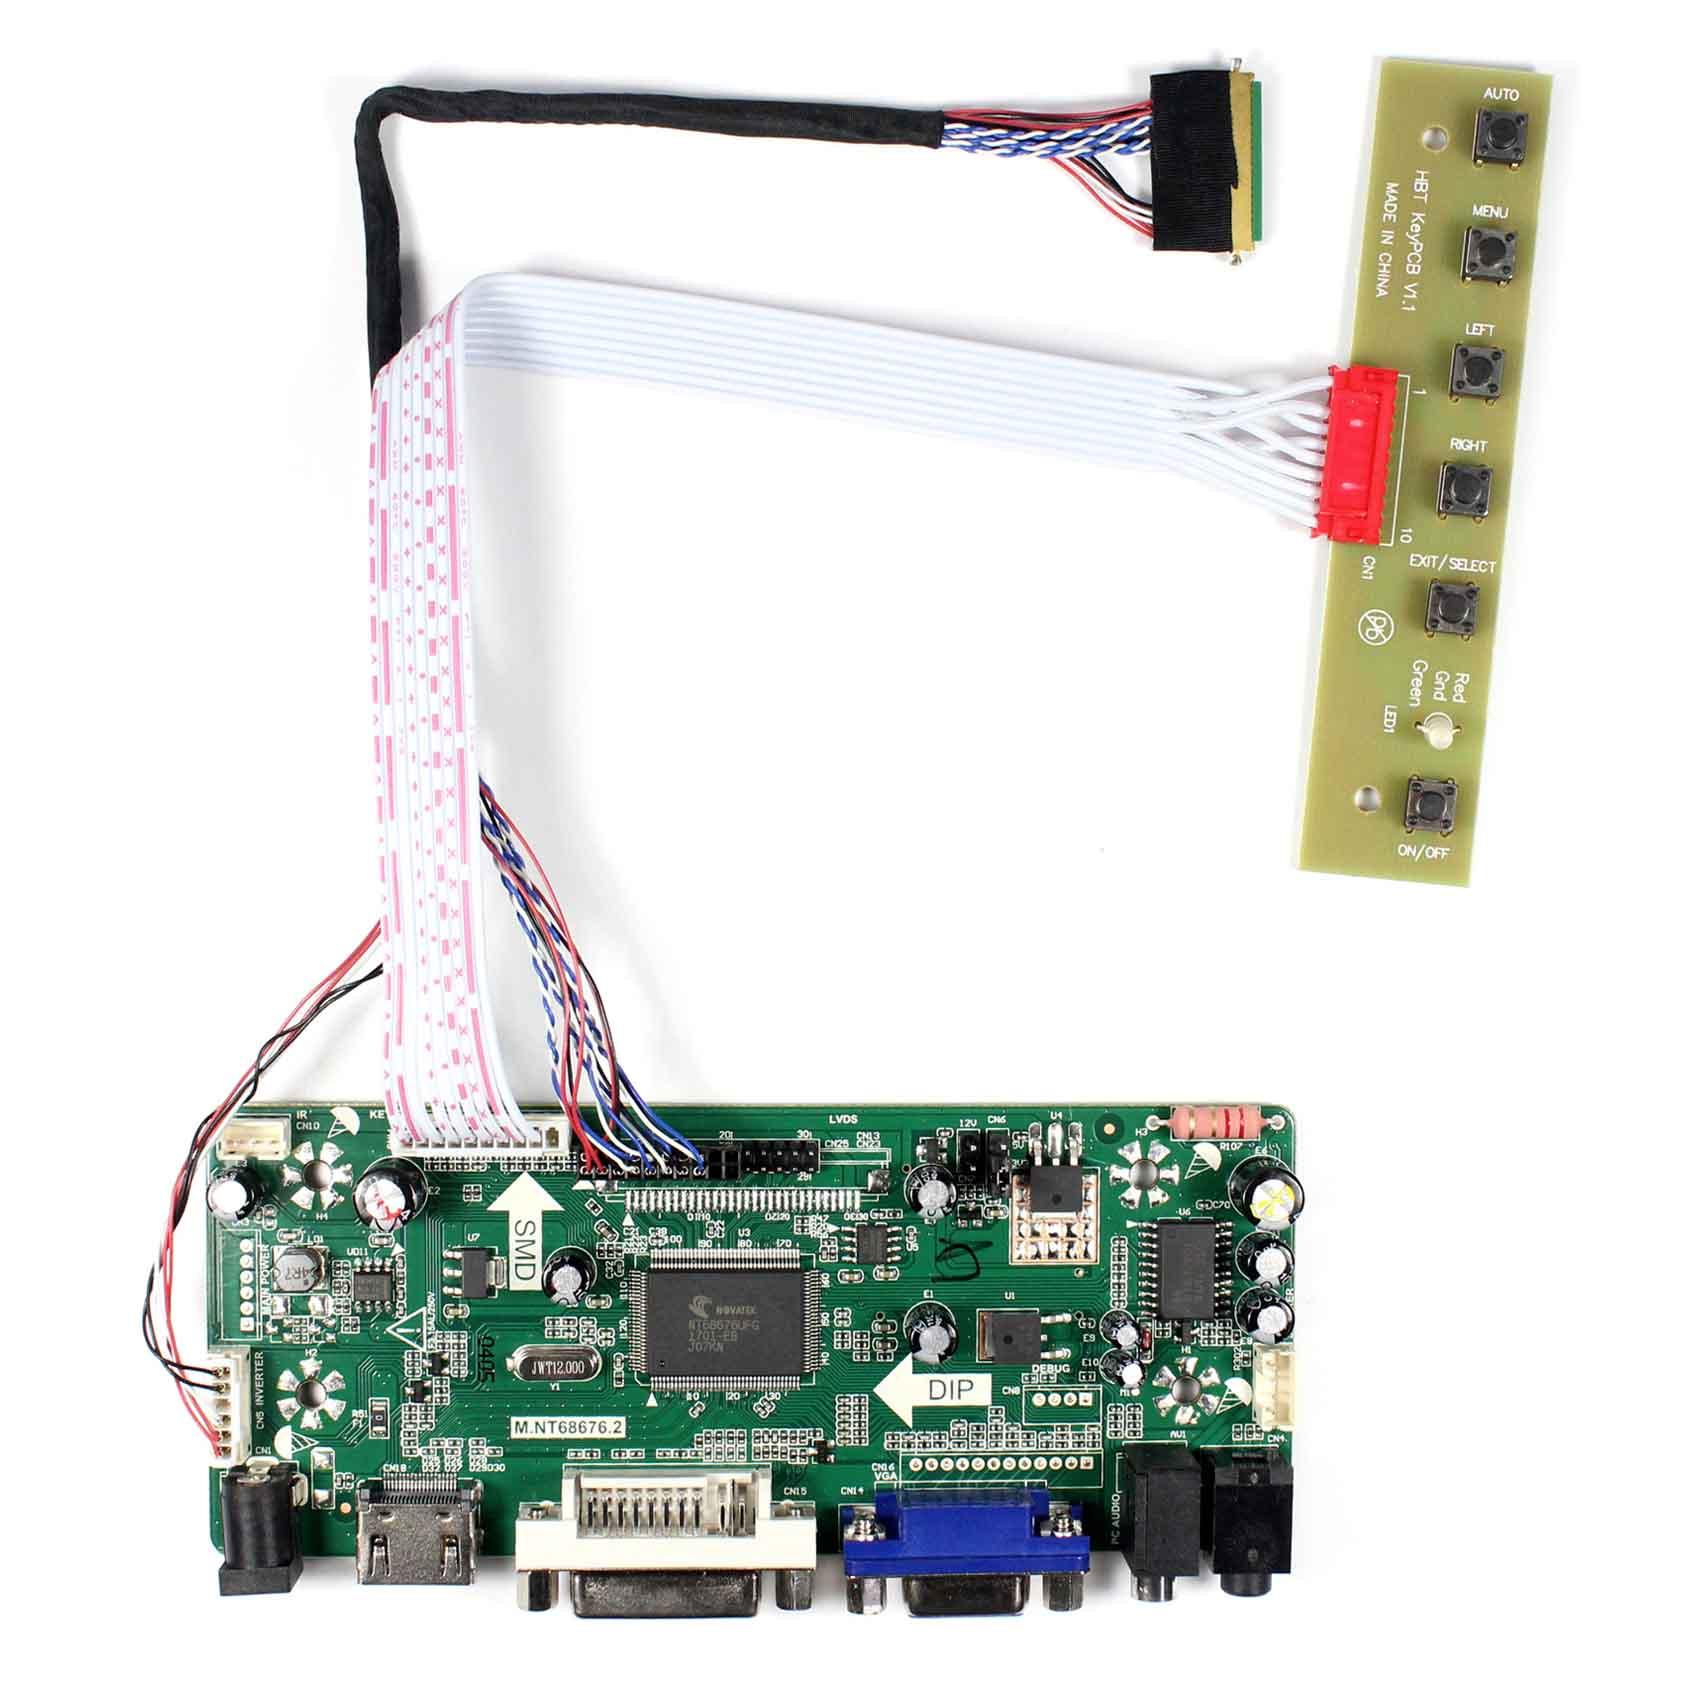 HDMI DVI VGA Audio LCD Controller Board Work for 10.1inch LP101WH2 N101BFE 1024X600 LCD Screen vga hdmi lcd controller board for lp156whu tpb1 lp156whu tpa1 lp156whu tpbh lp156whu tpd1 15 6 inch edp 30 pins 1 lane 1366x768